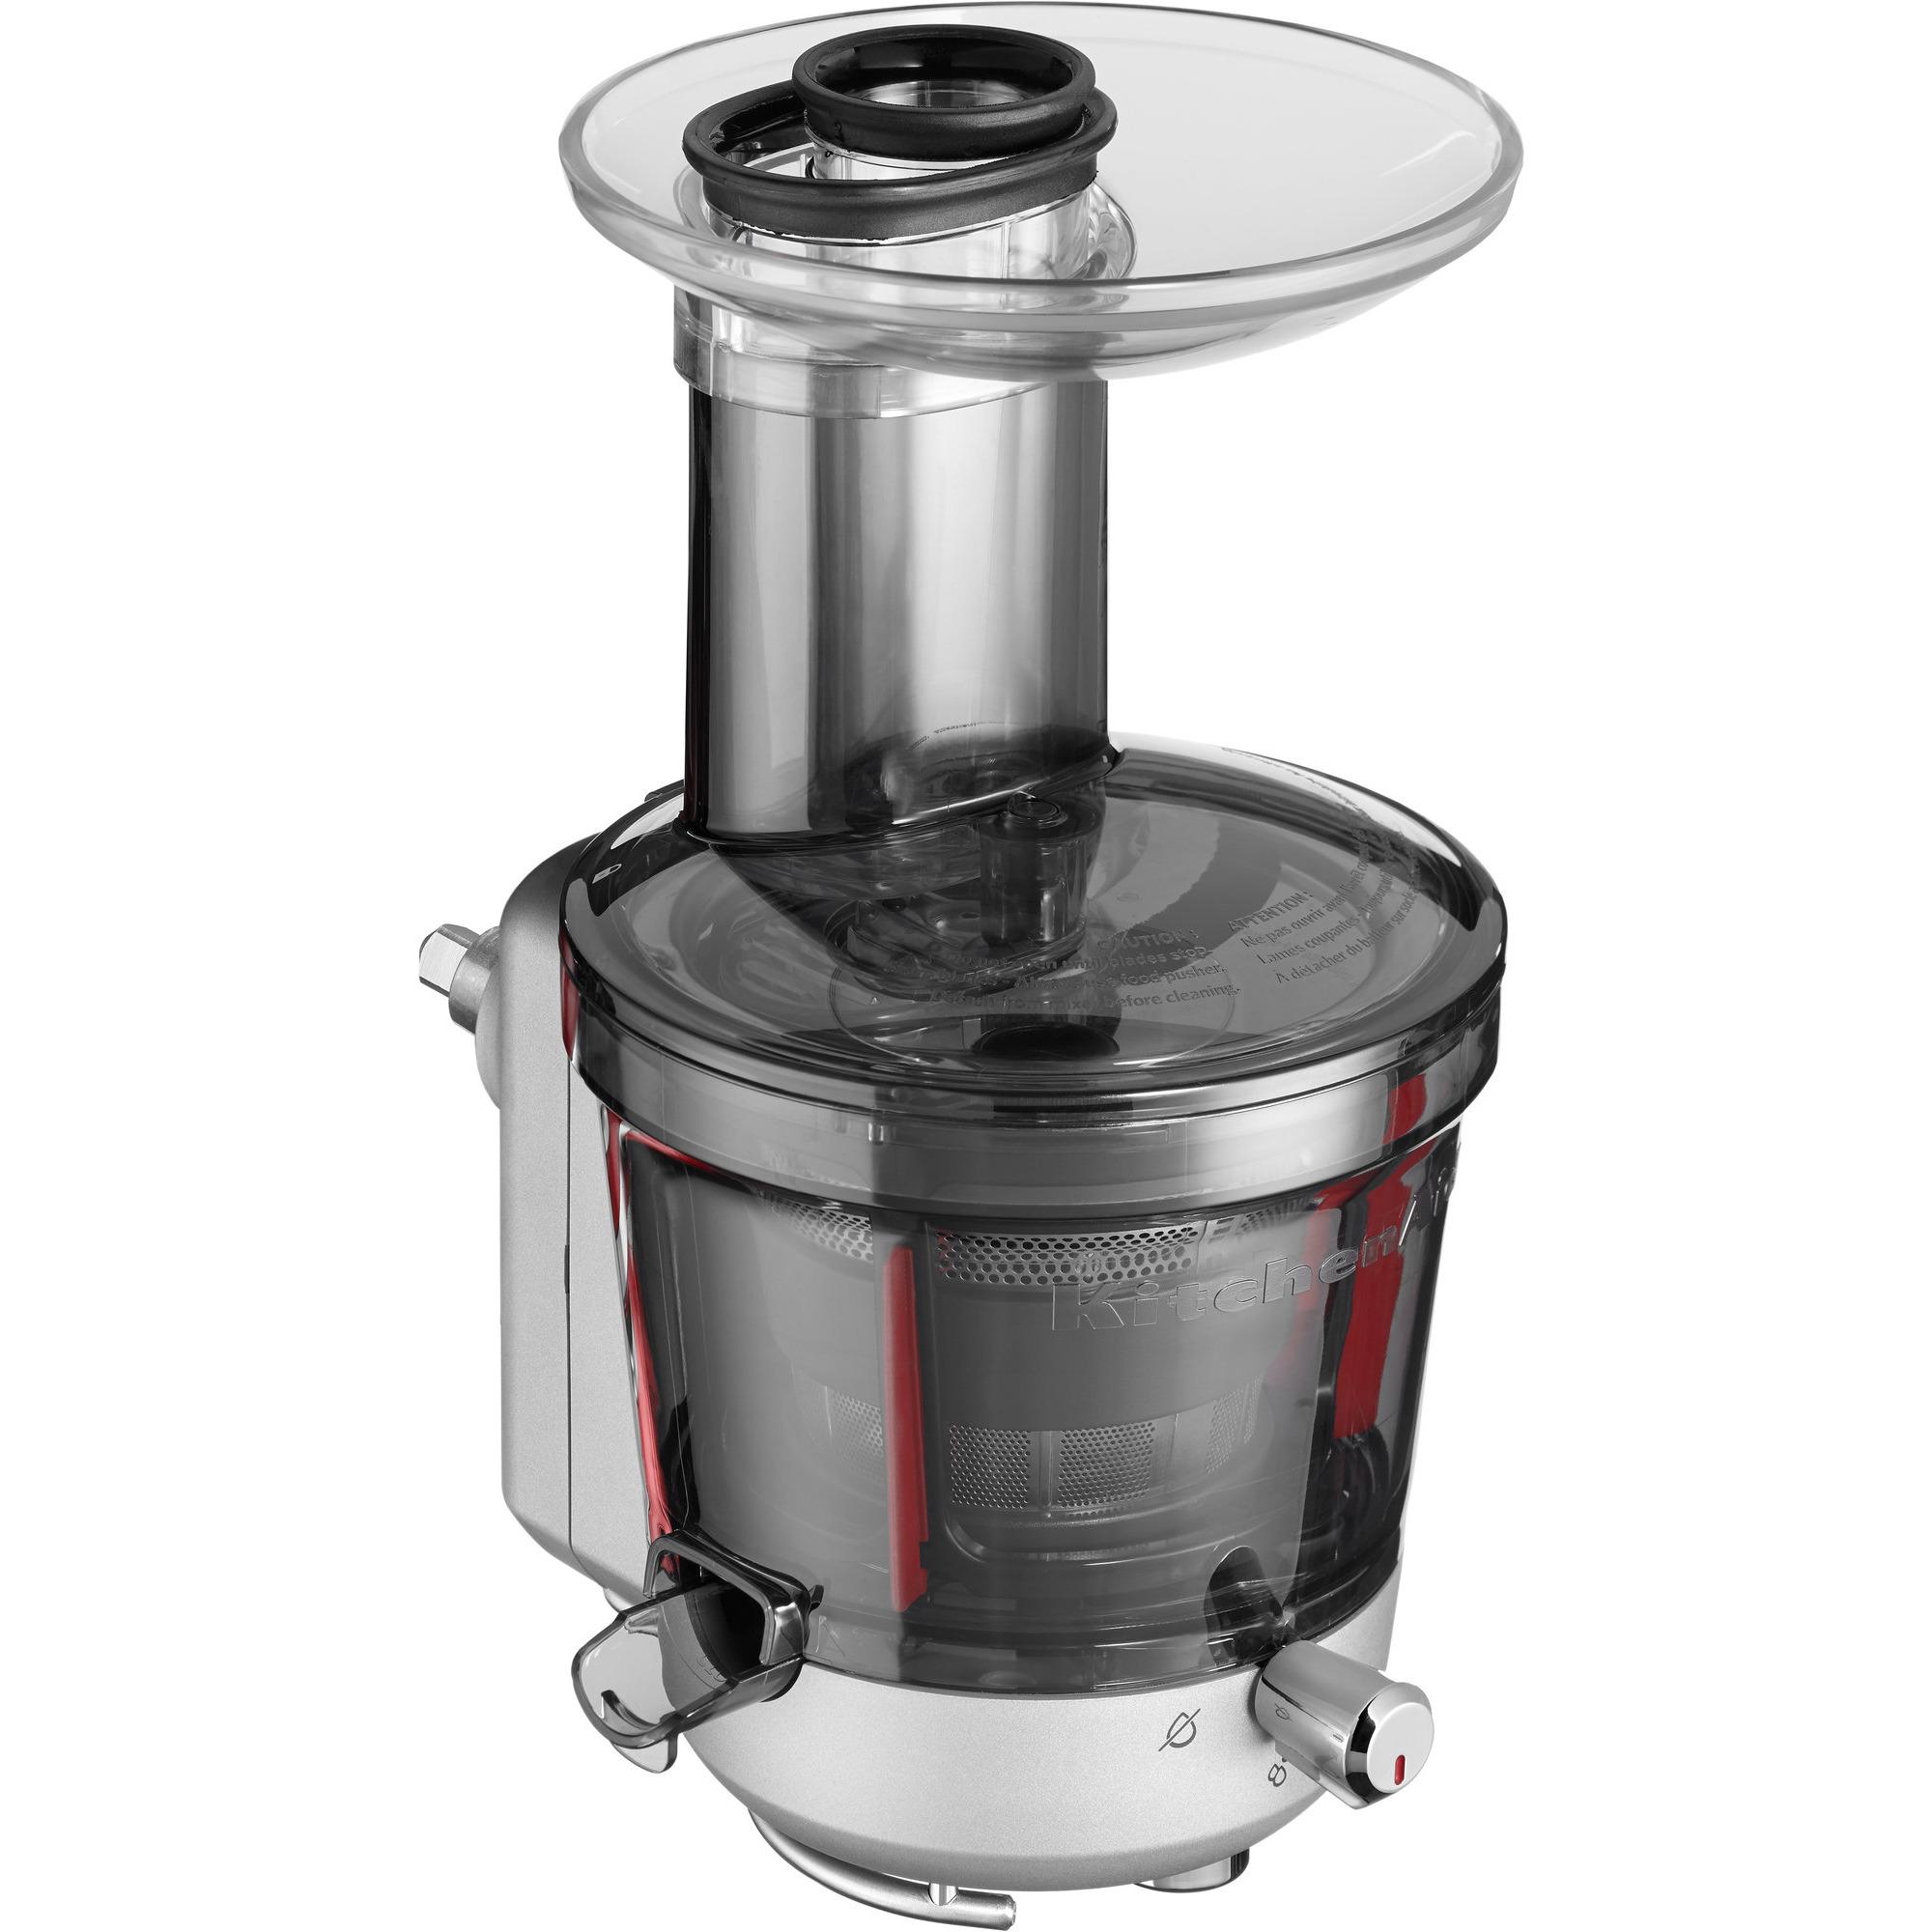 KitchenAid Slowjuicer till Köksmaskin